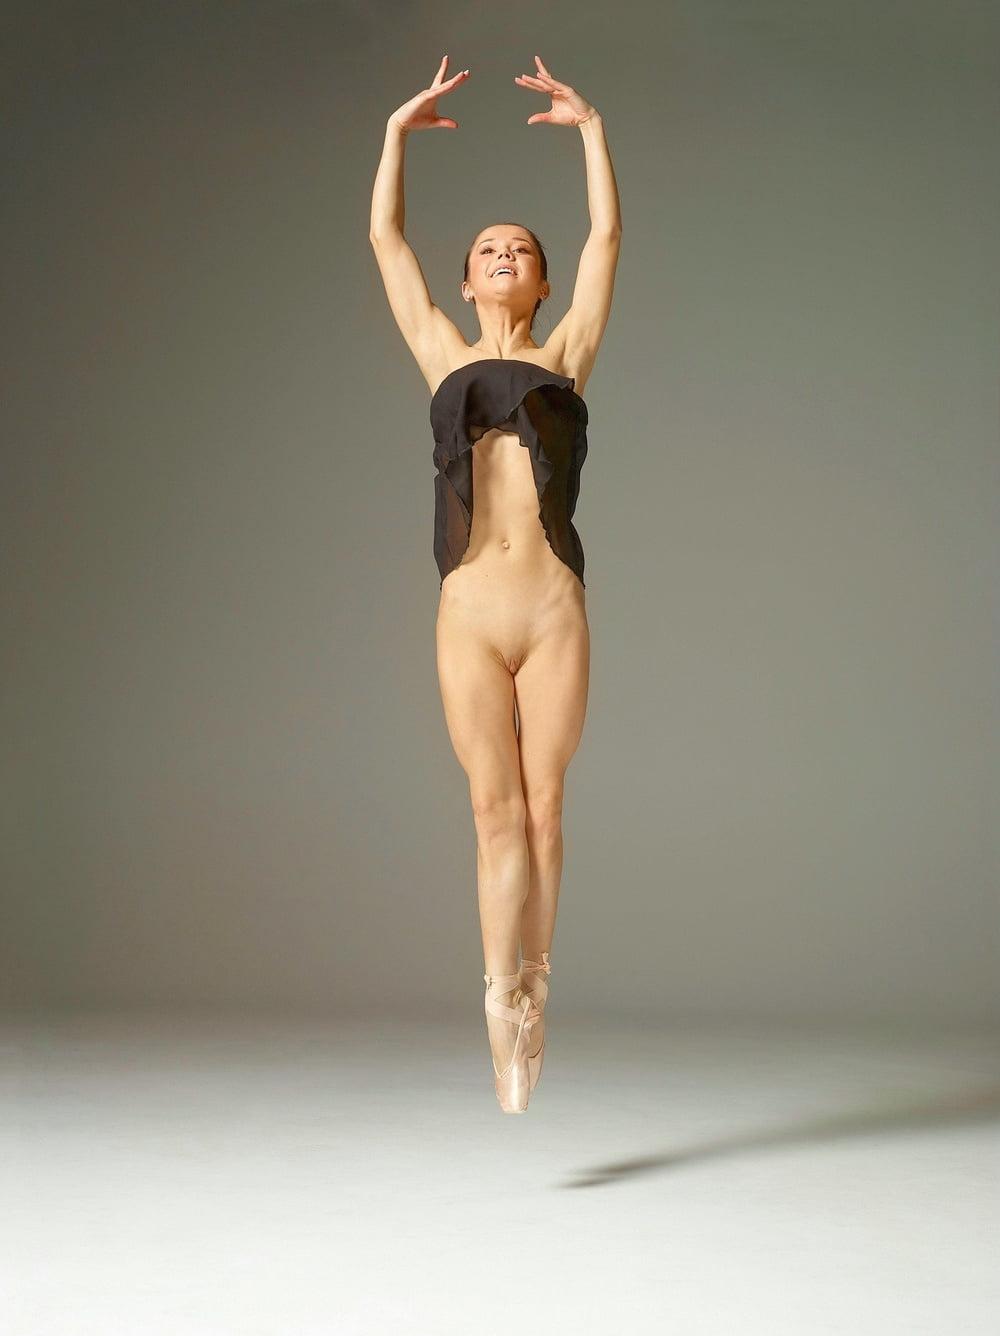 Half naked ballerina pics — pic 4